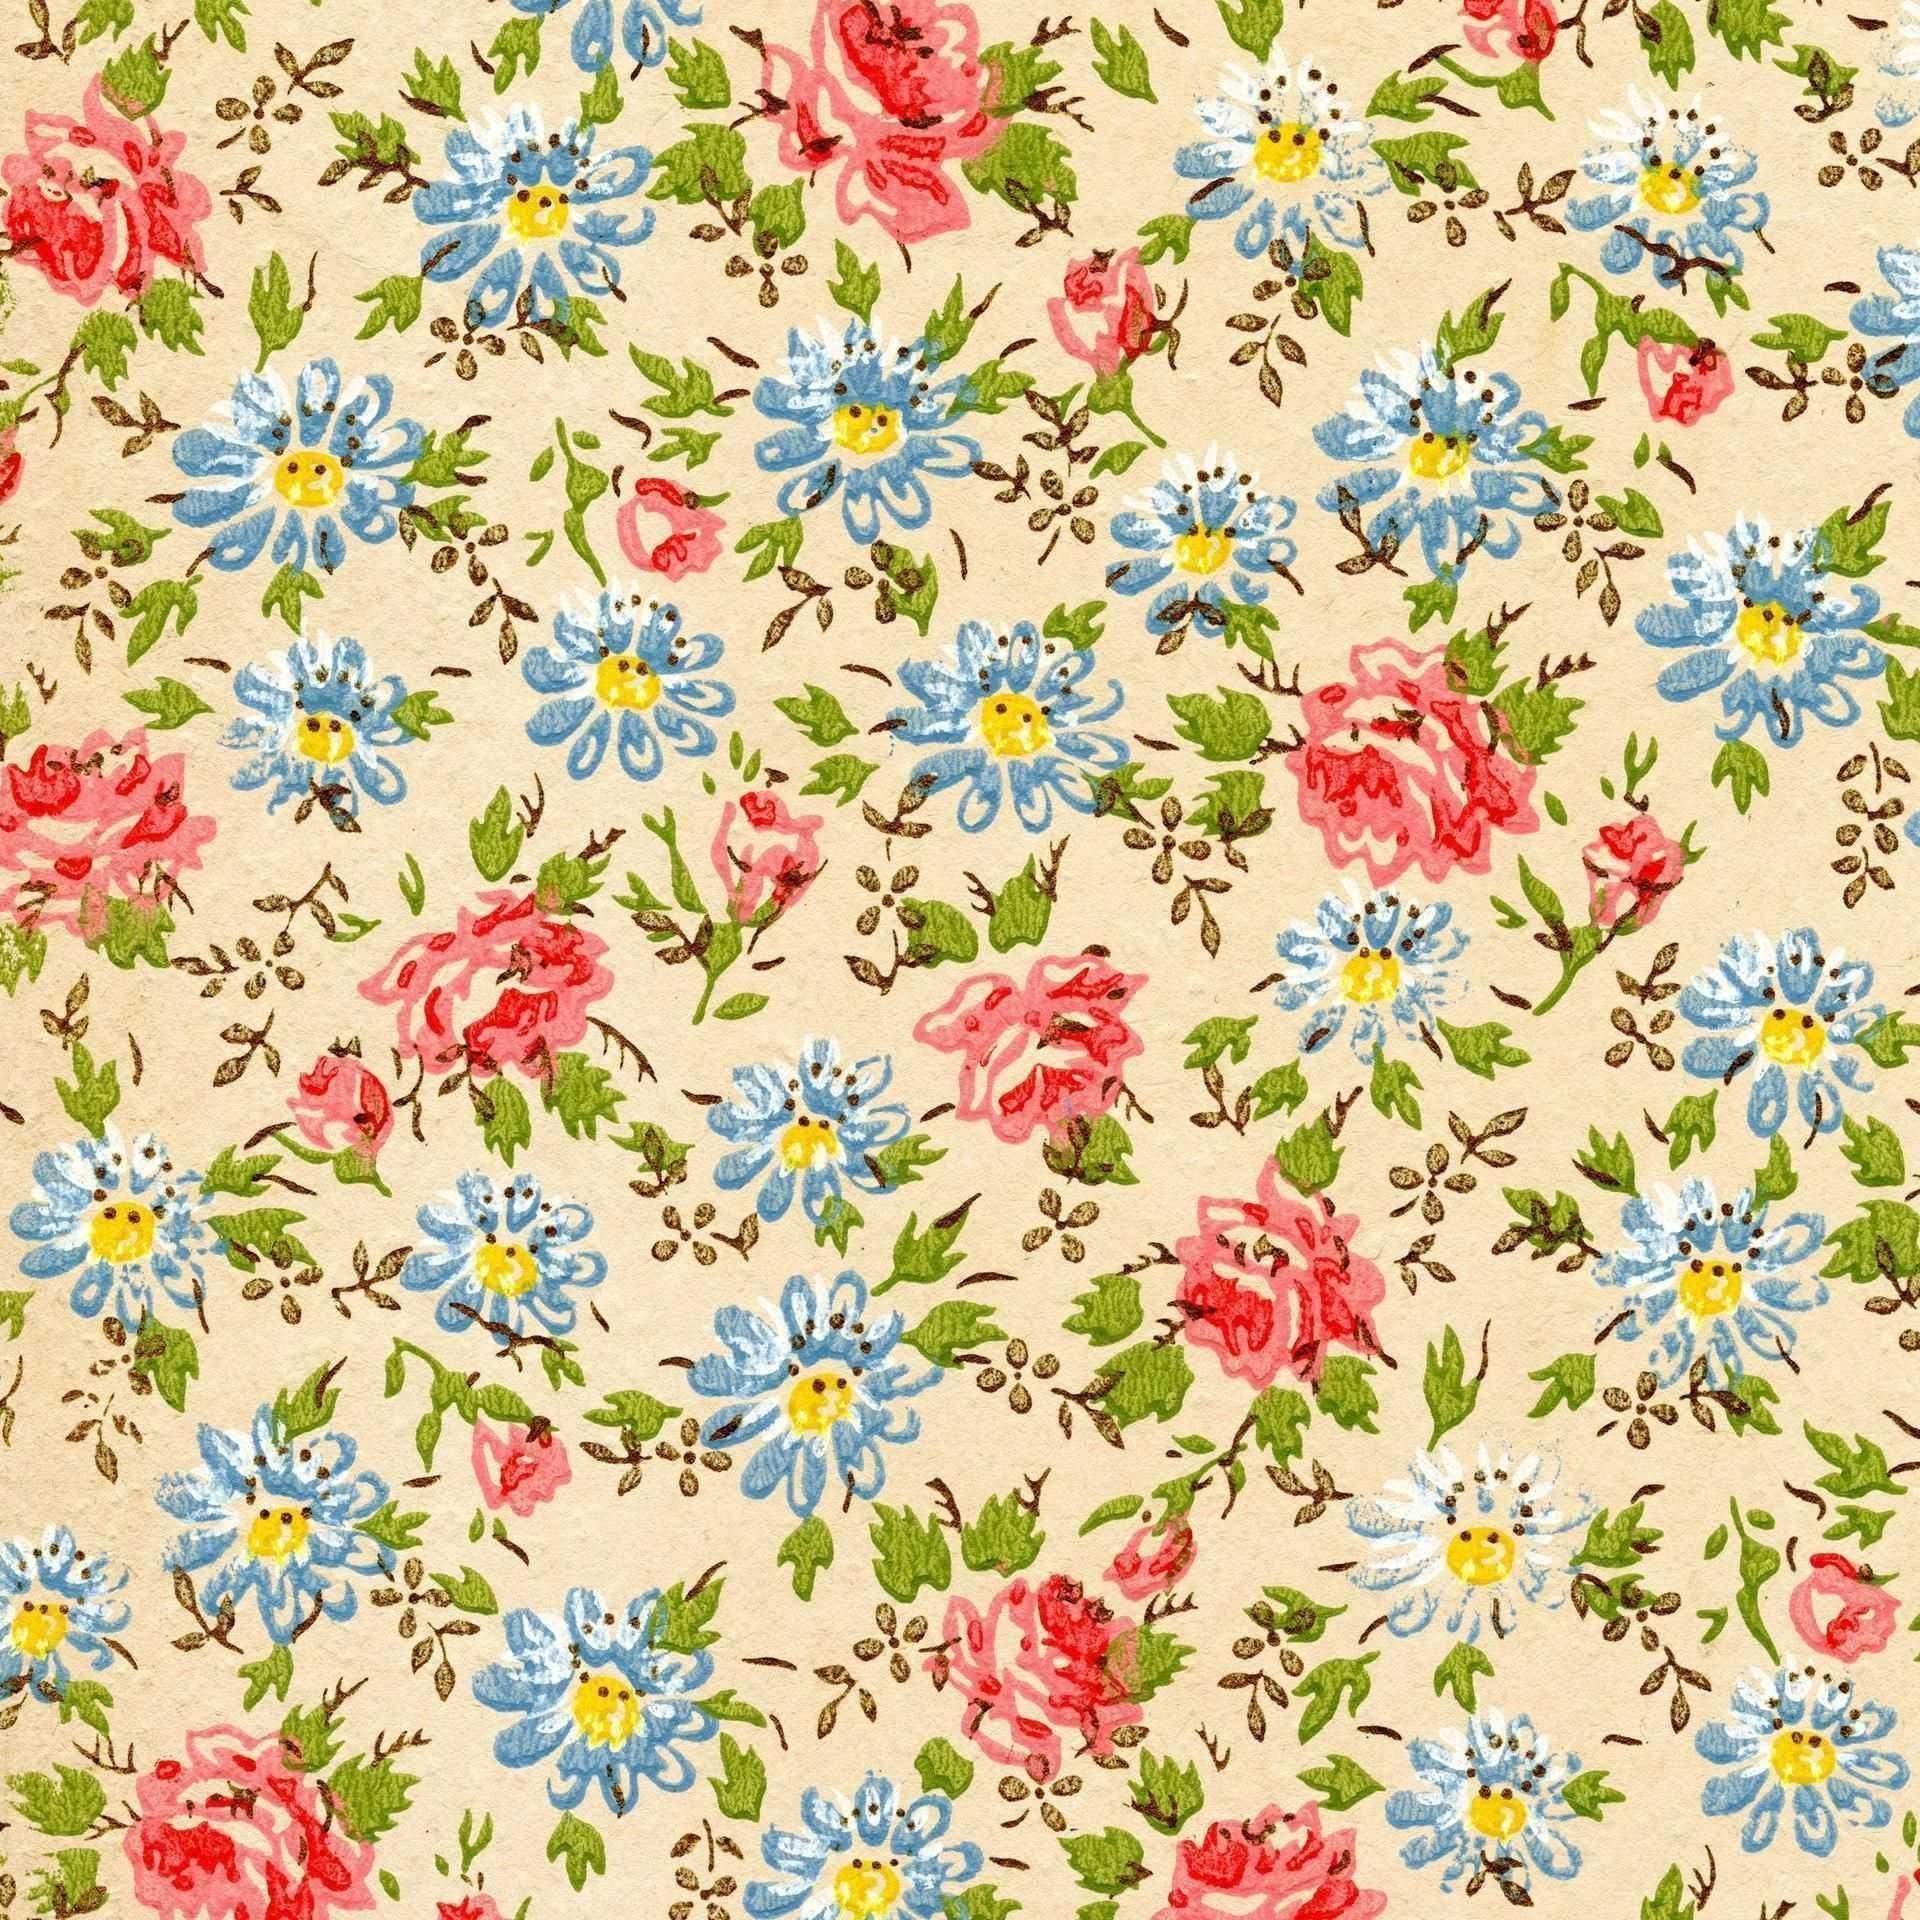 Title Vintage Flower Iphone Wallpaper Hd Pics Photos Floral Desktop Dimension 1920 X File Type JPG JPEG